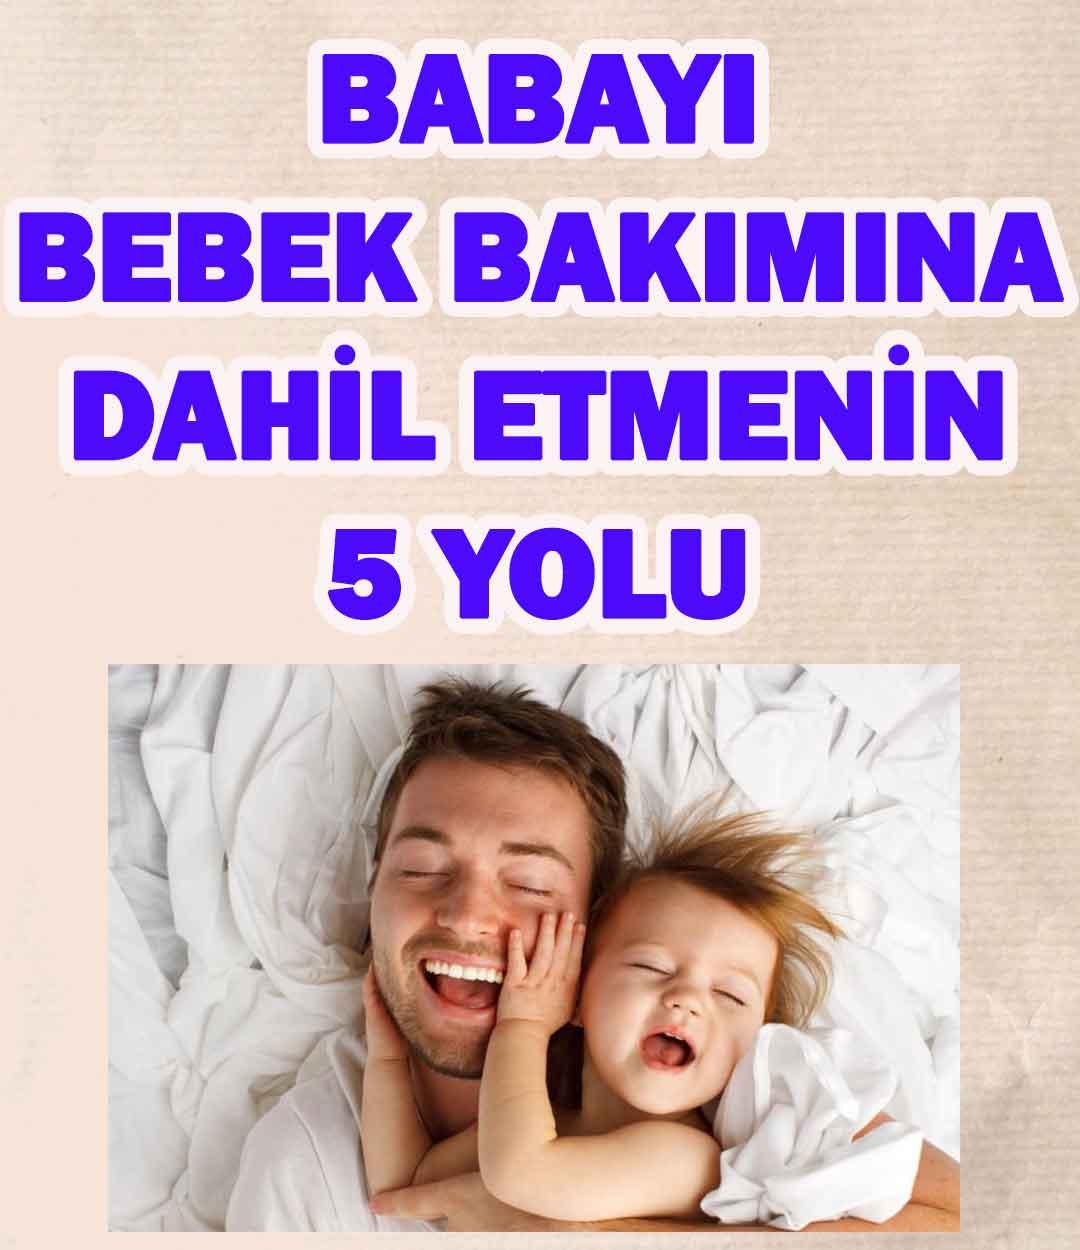 bababebek